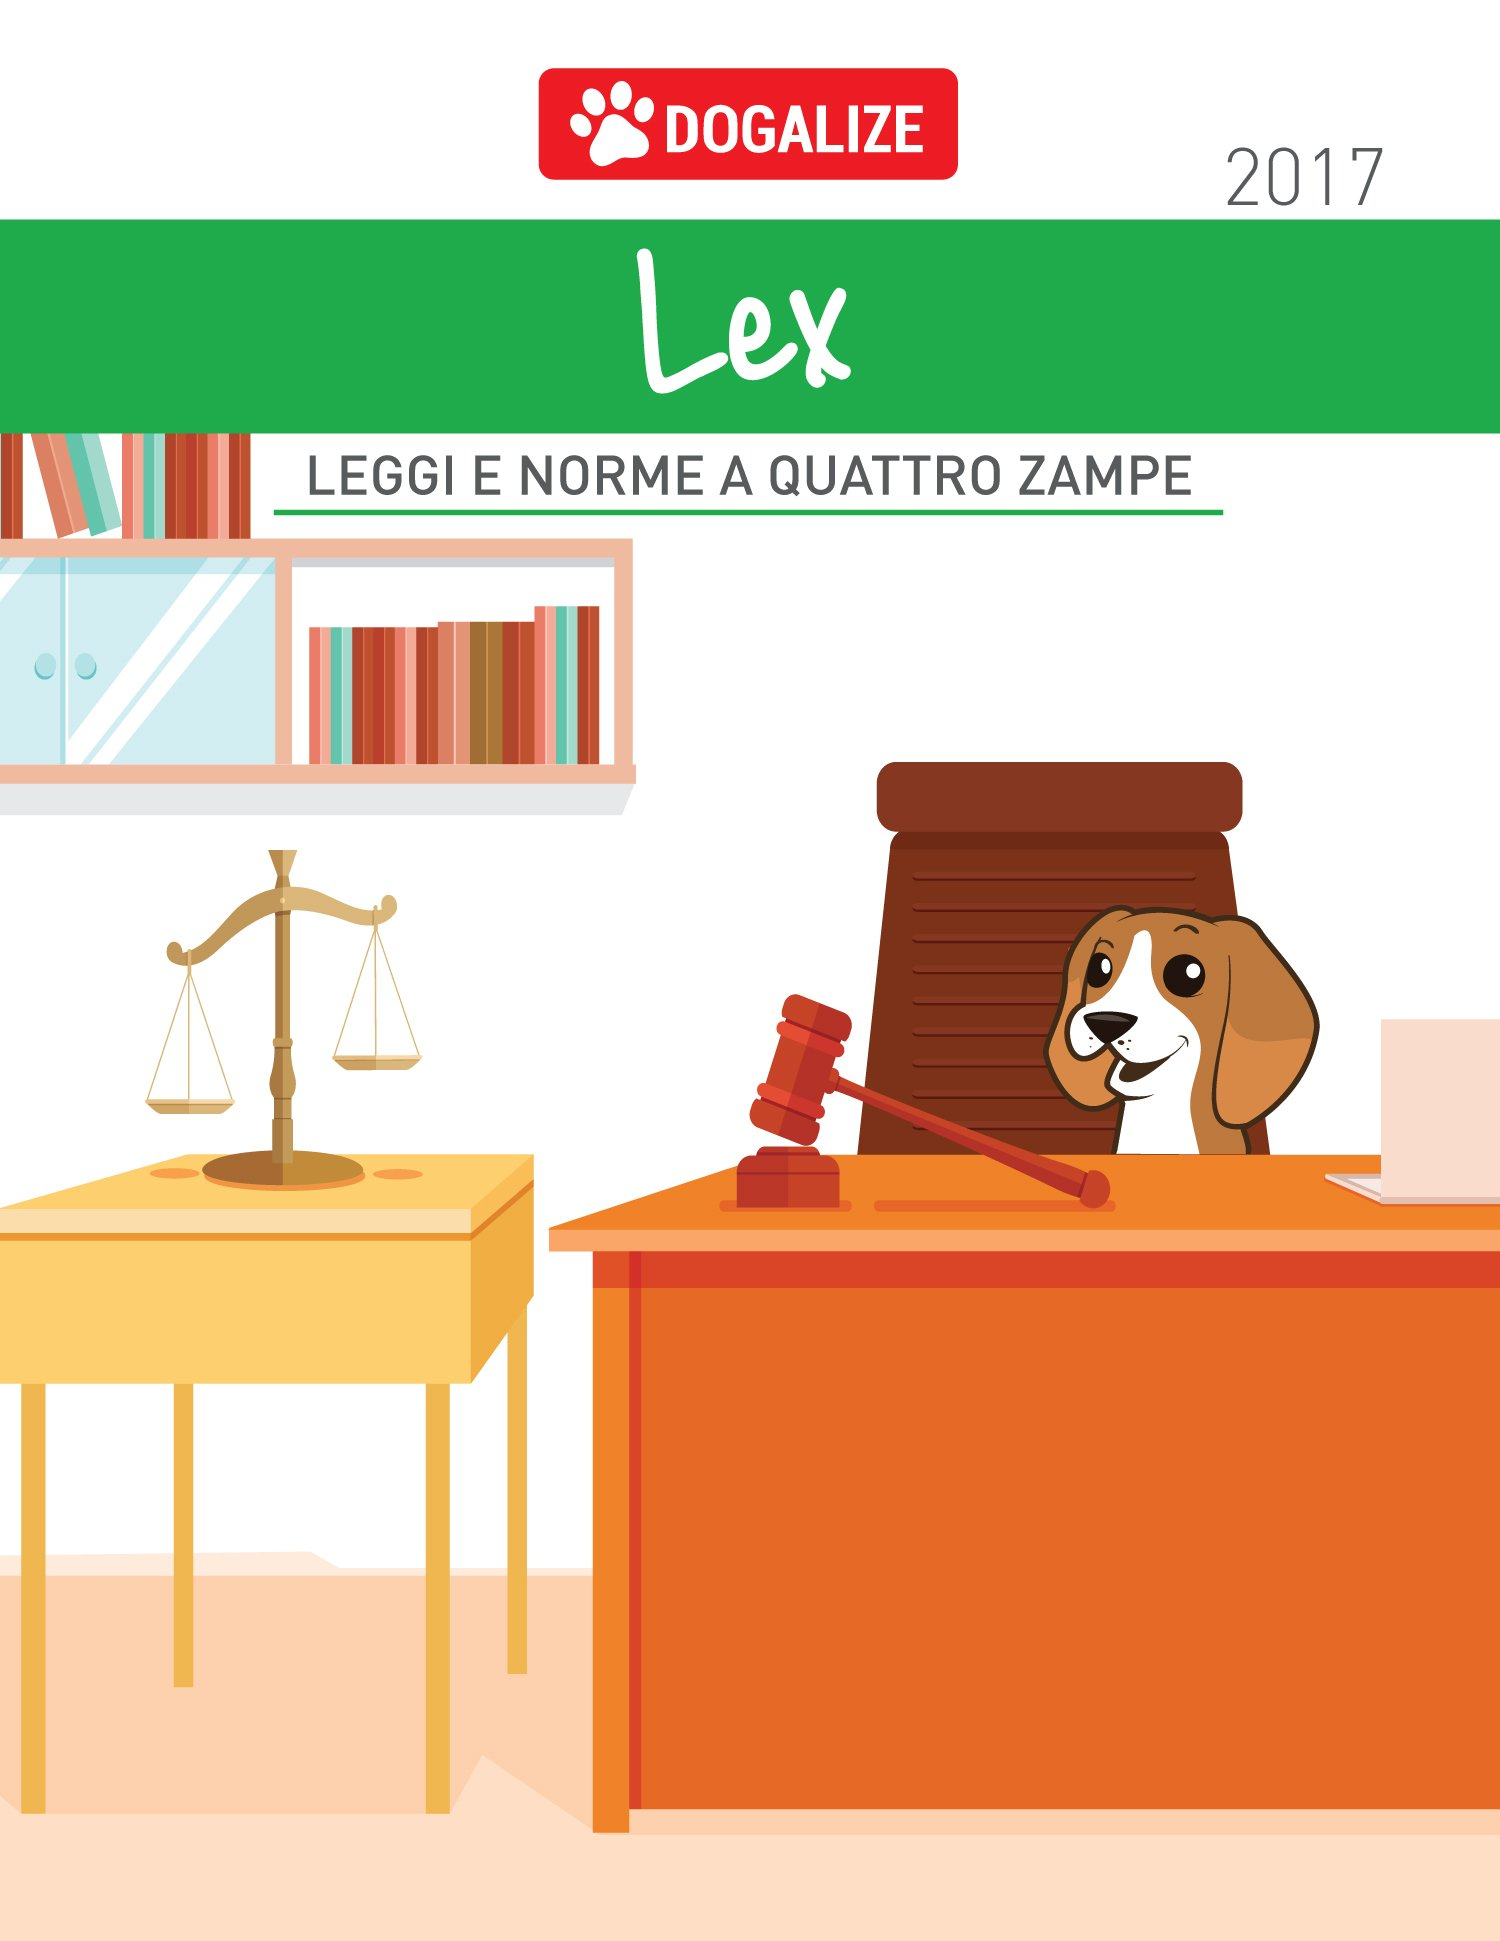 Dogalize Lex - il nuovo Ebook Dogalize sui diritti e doveri animali!